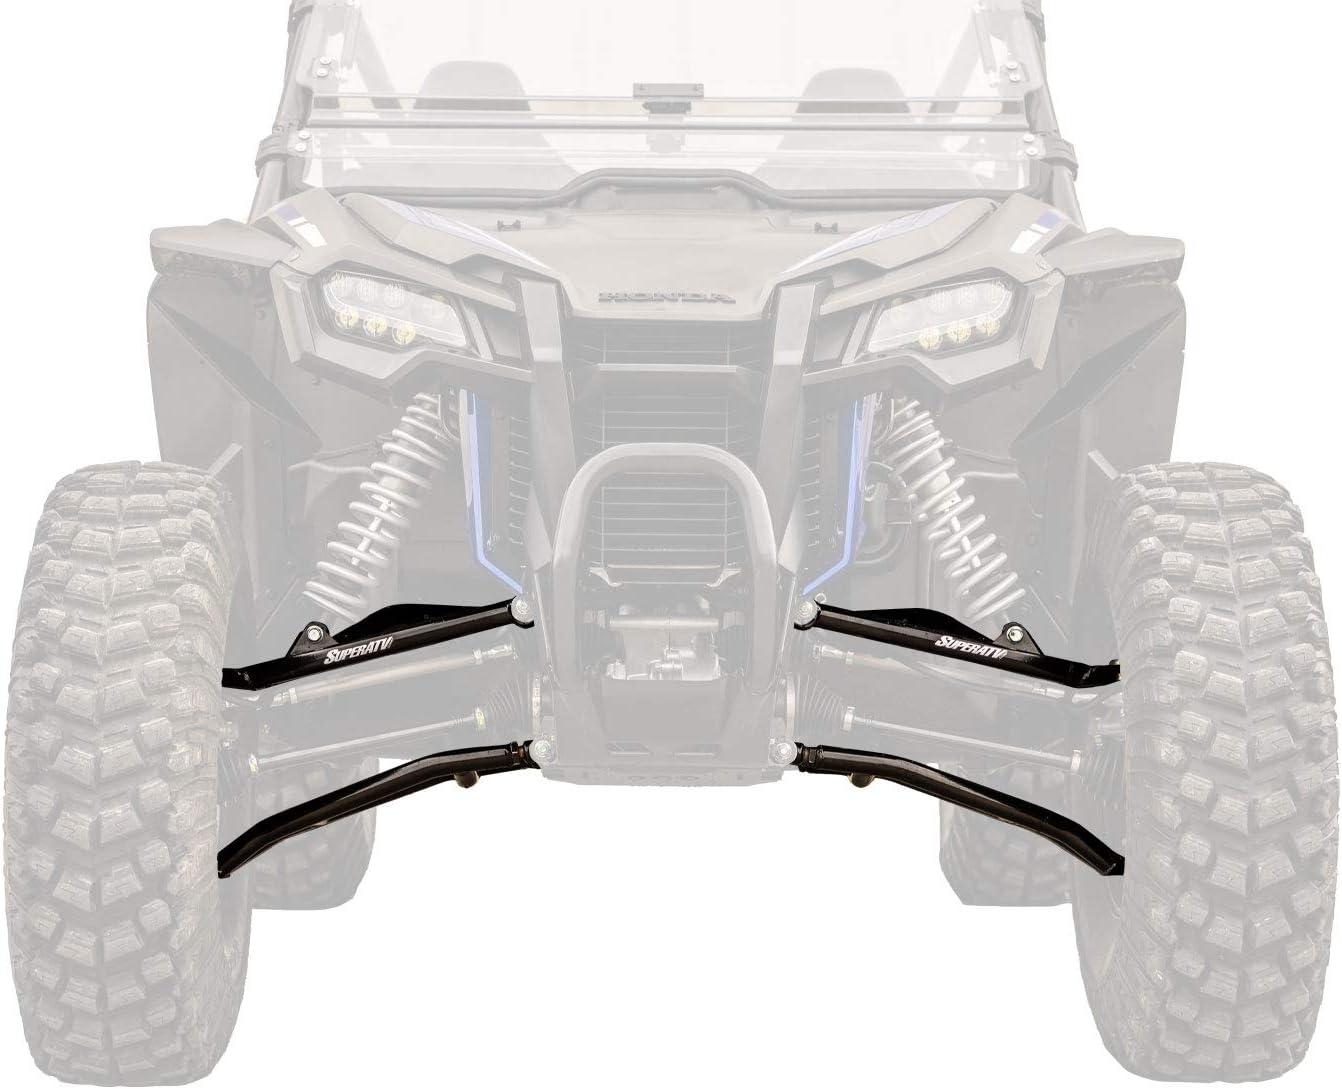 SuperATV Heavy Duty Rhino Rear CV Axle for 2019 12-Month Warranty 1 REAR Axle Honda Talon 1000R